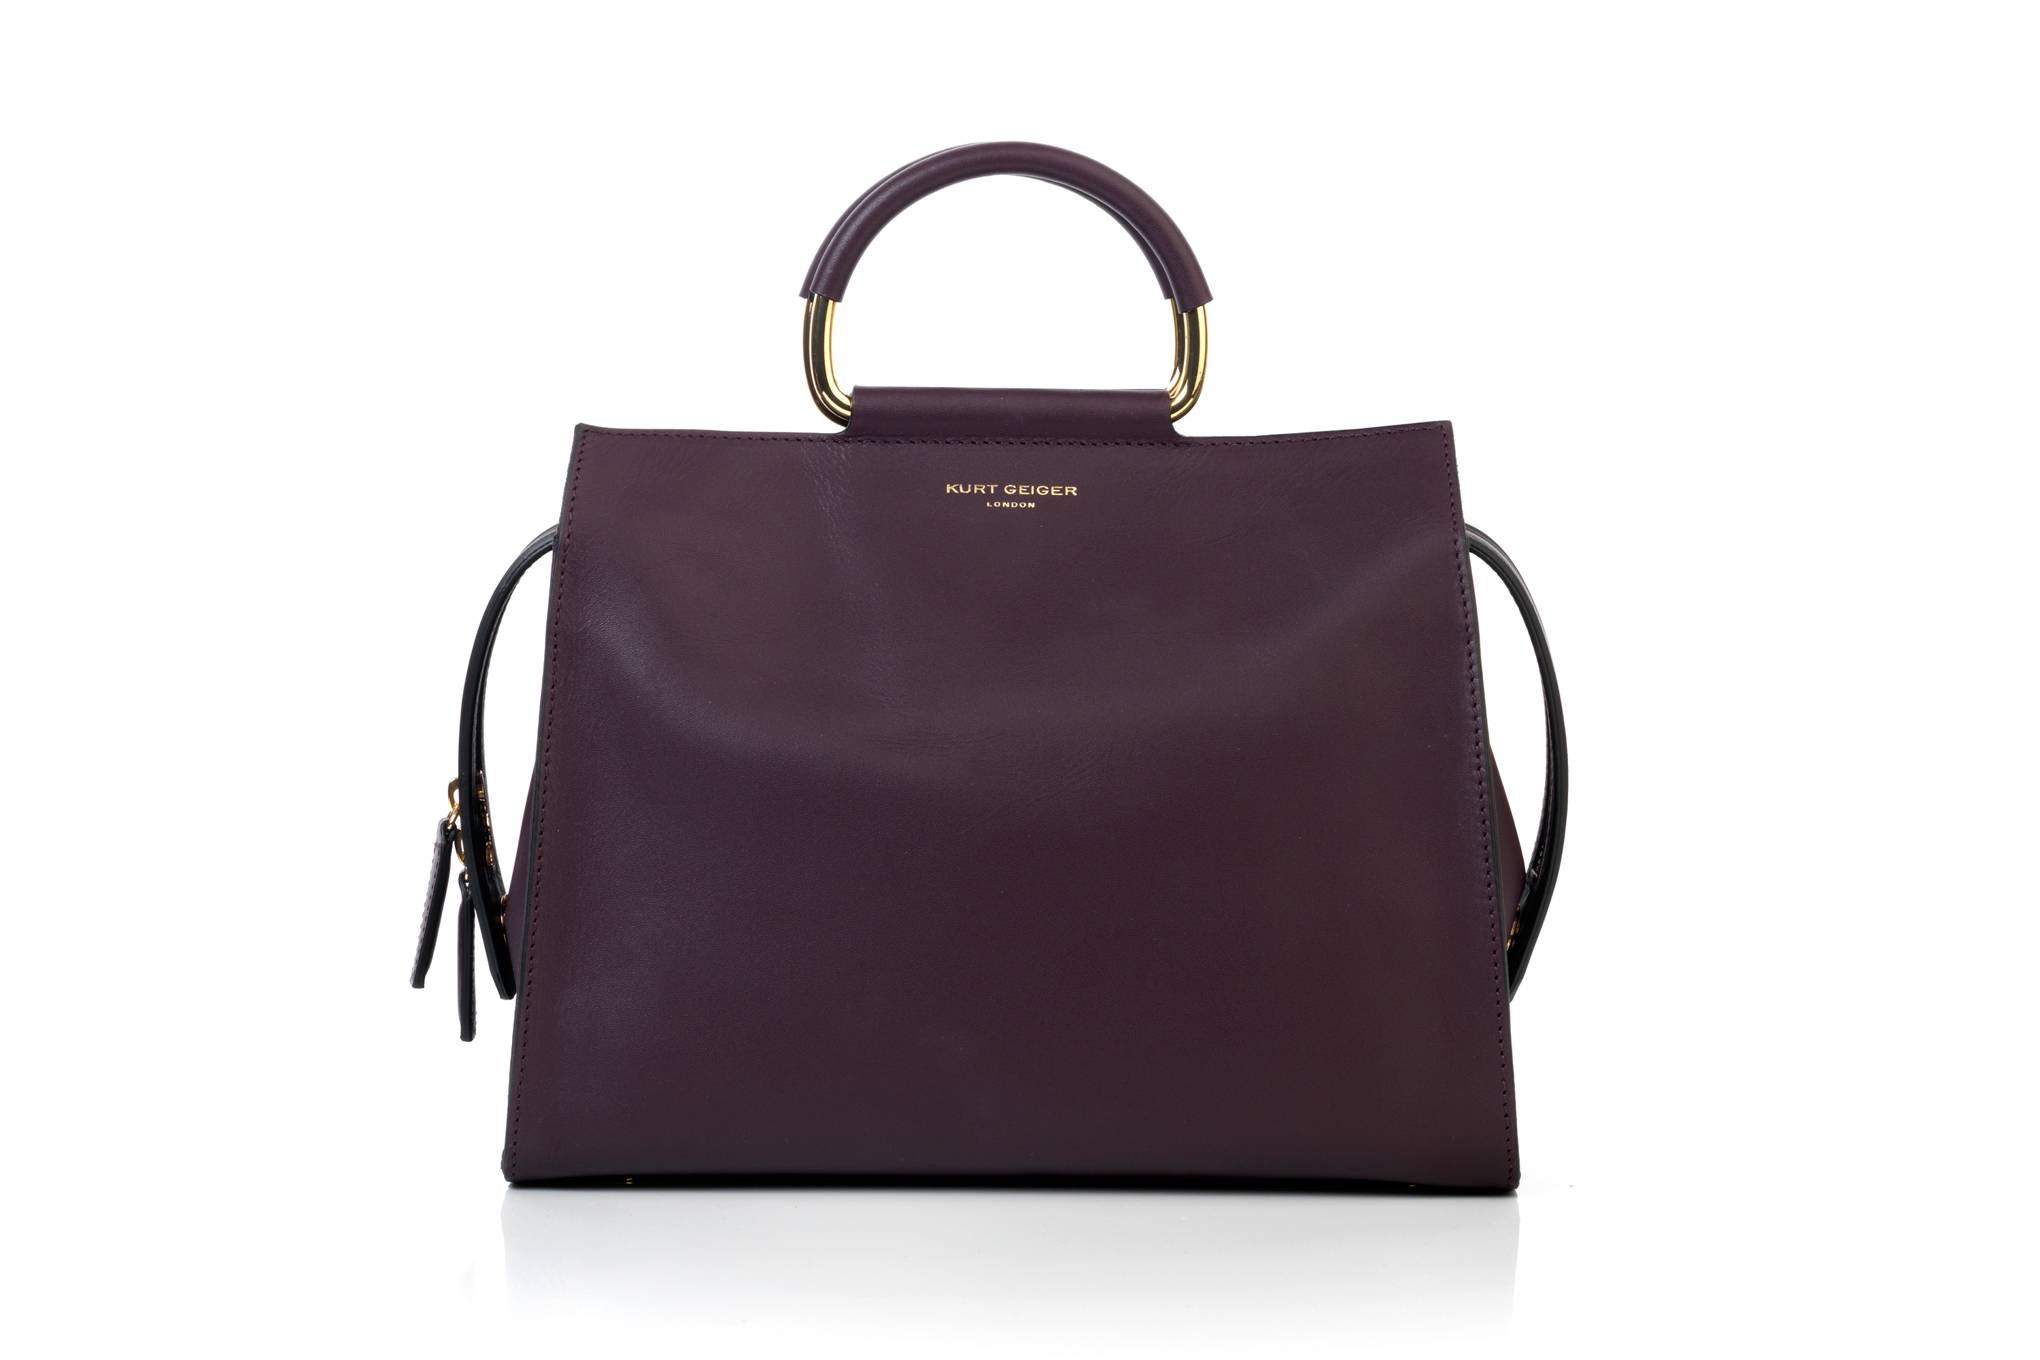 85cc8797c1 Best Top-Handle Bags 2017   British Vogue